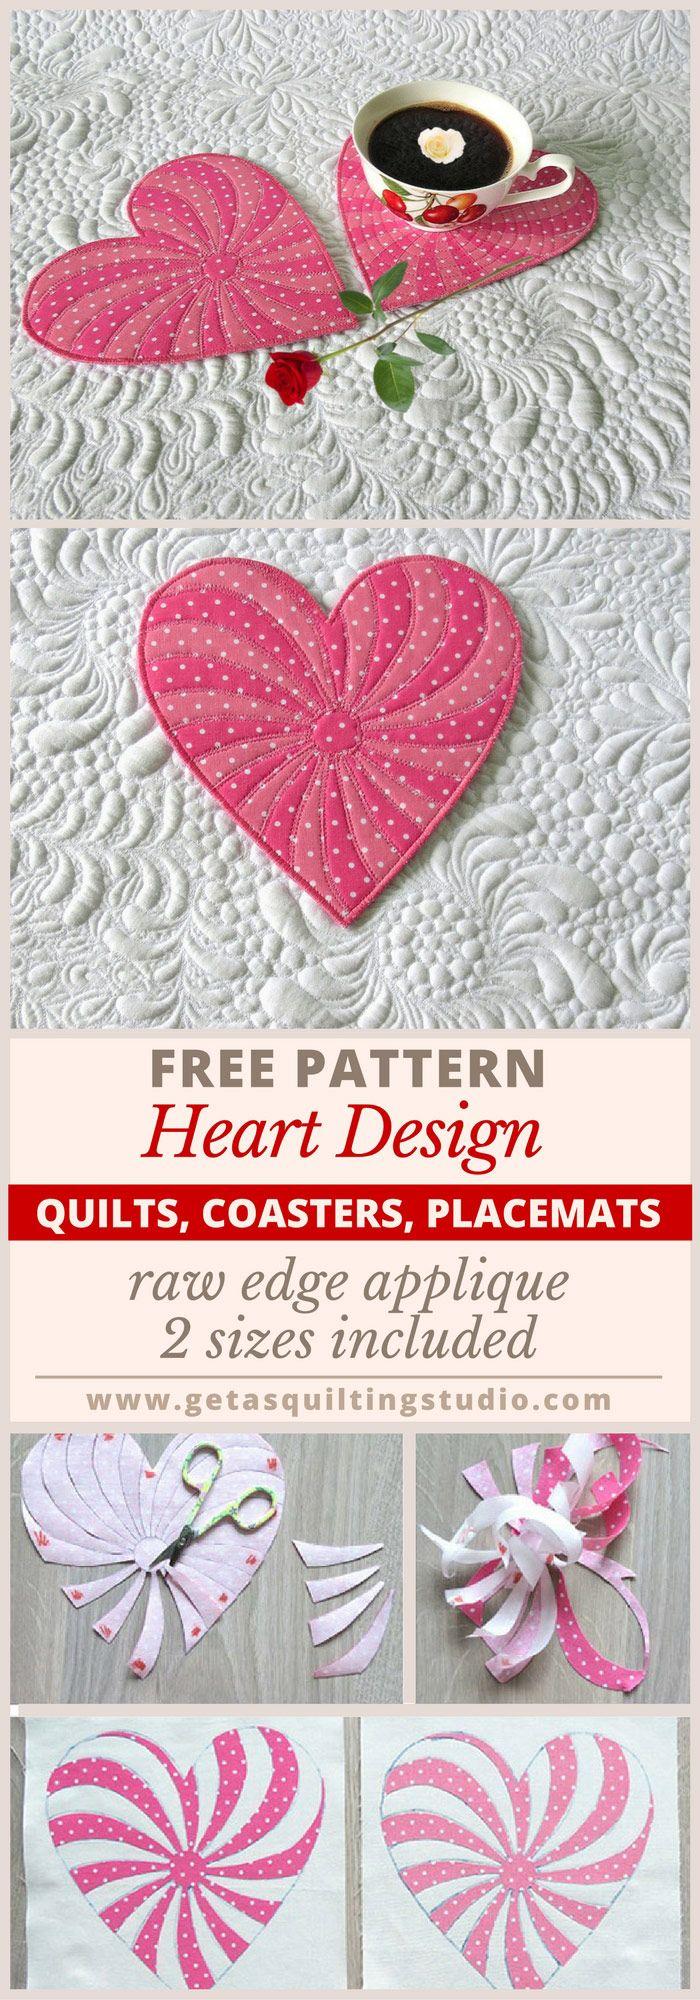 250 best images about Heart on Pinterest : free heart quilt patterns - Adamdwight.com